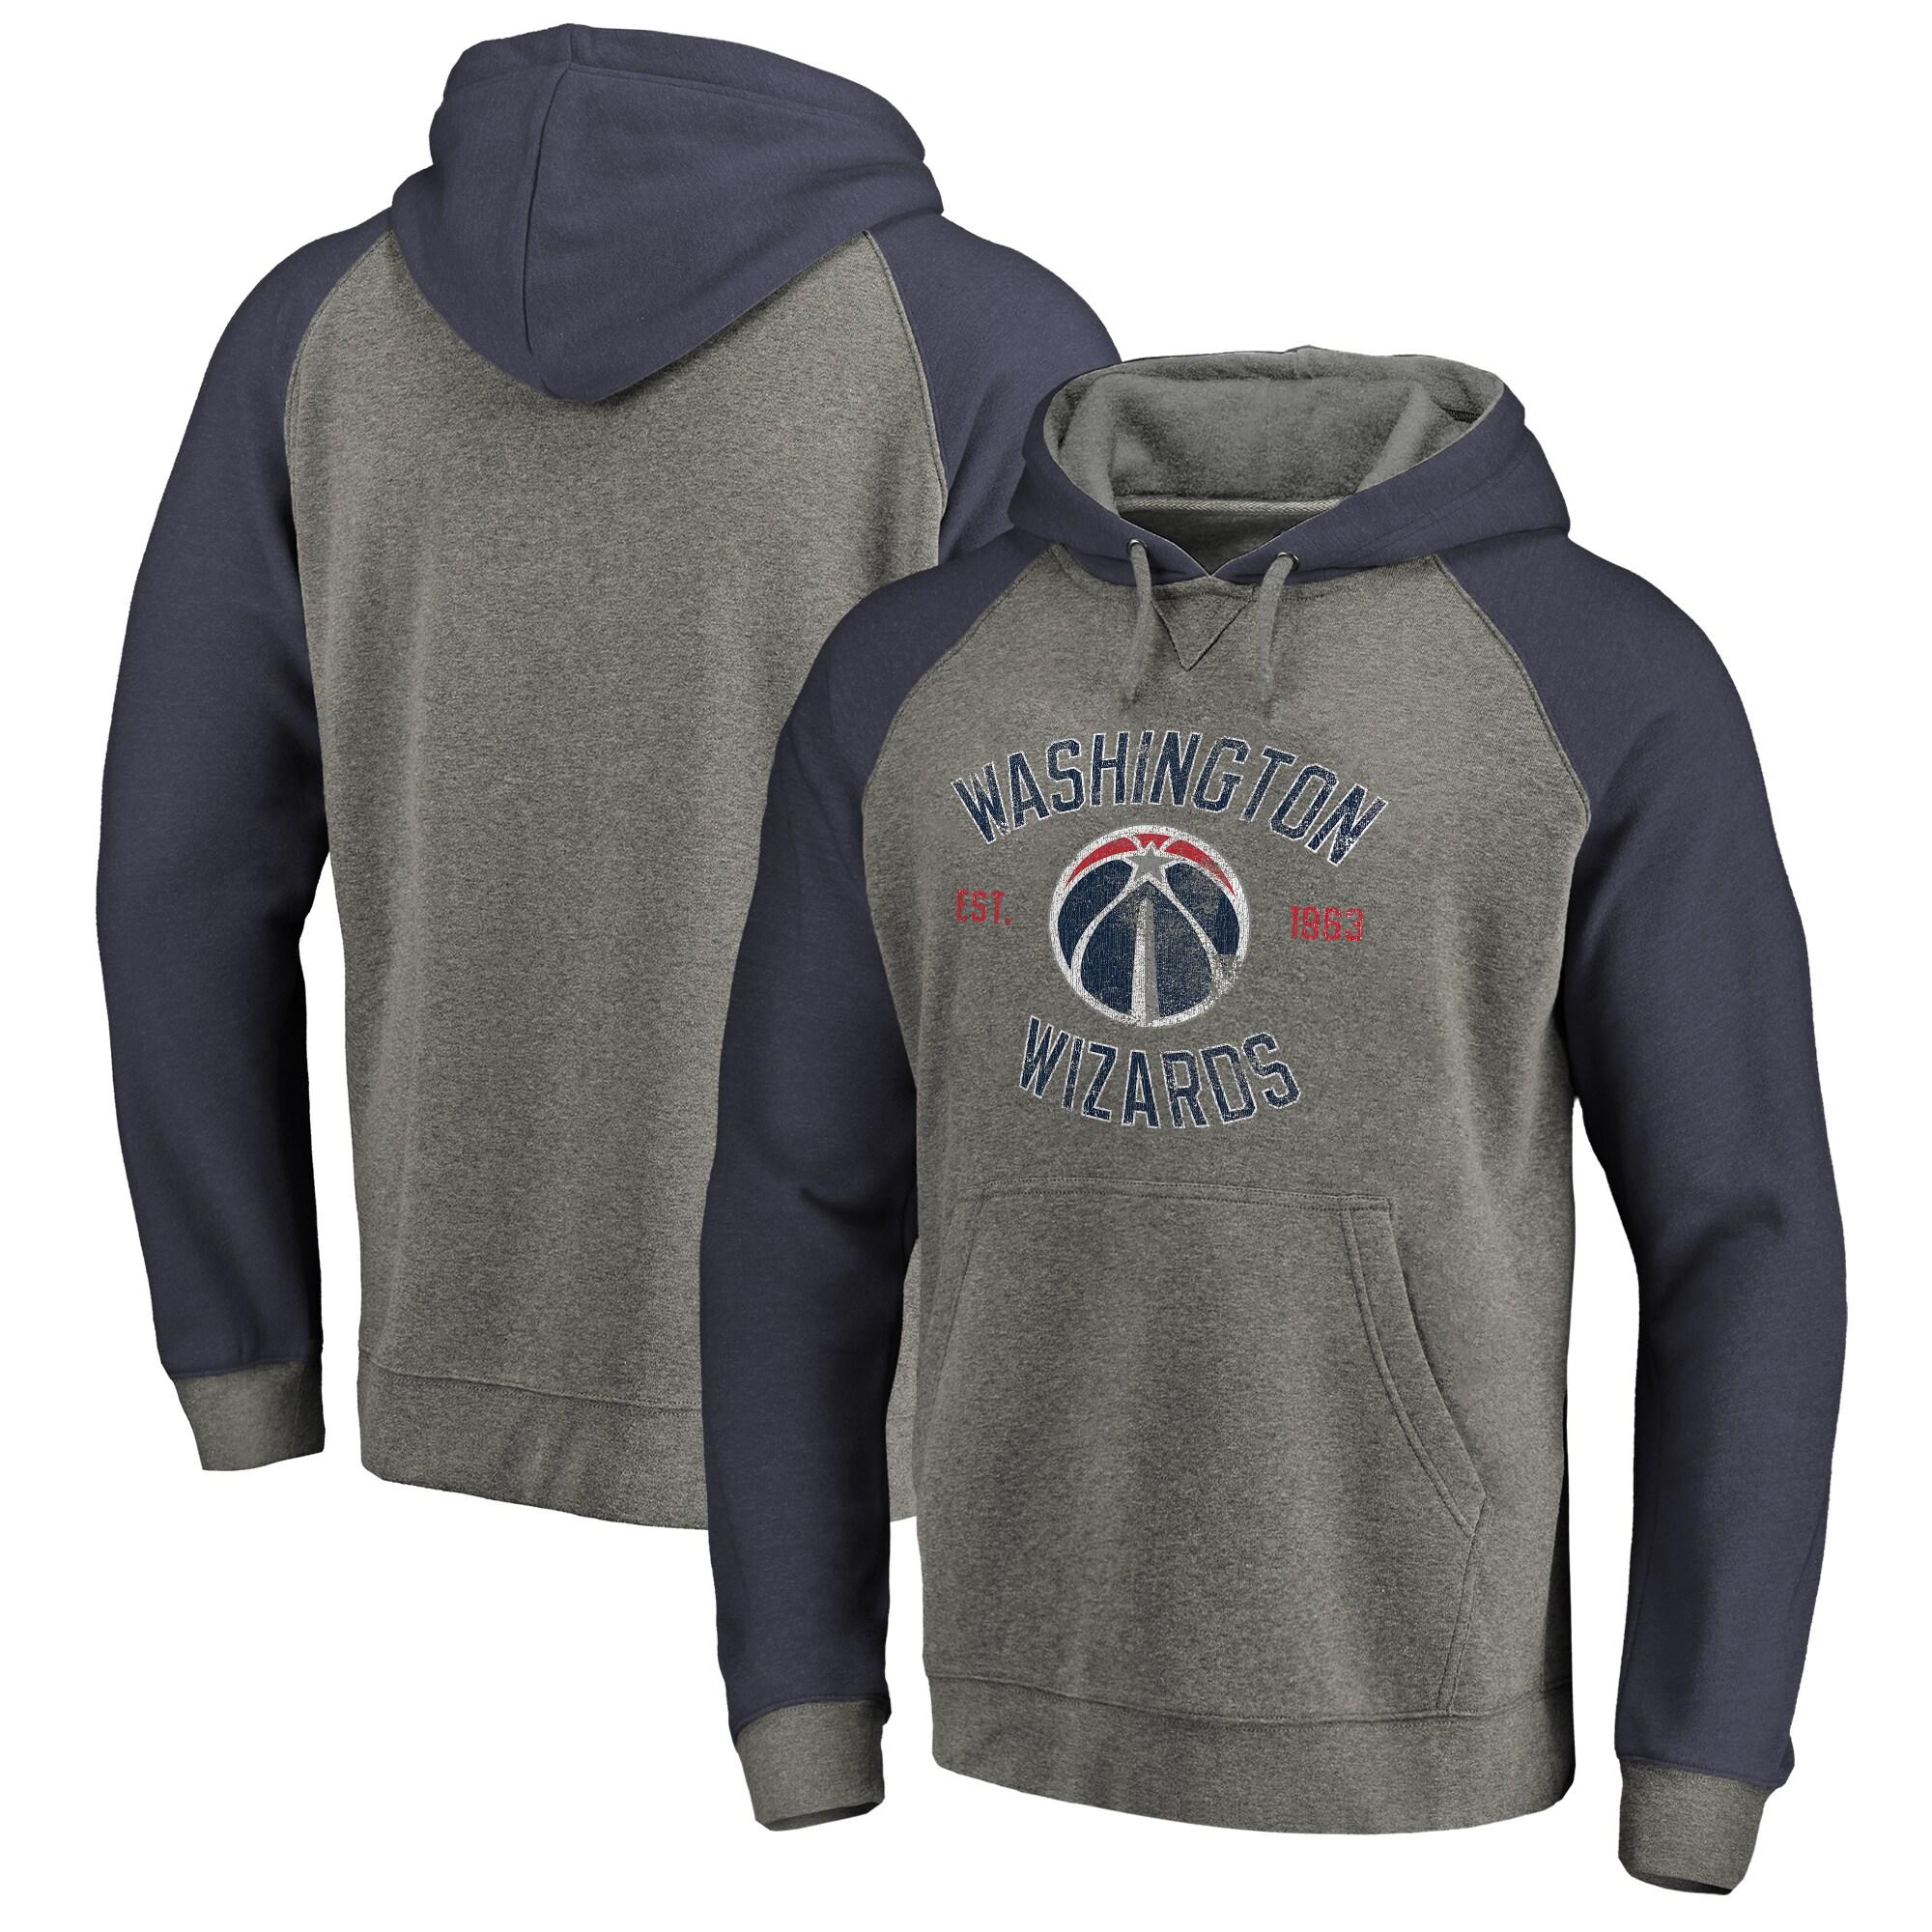 Washington Wizards Fanatics Branded Heritage Tri-Blend Raglan Pullover Hoodie - Heathered Gray